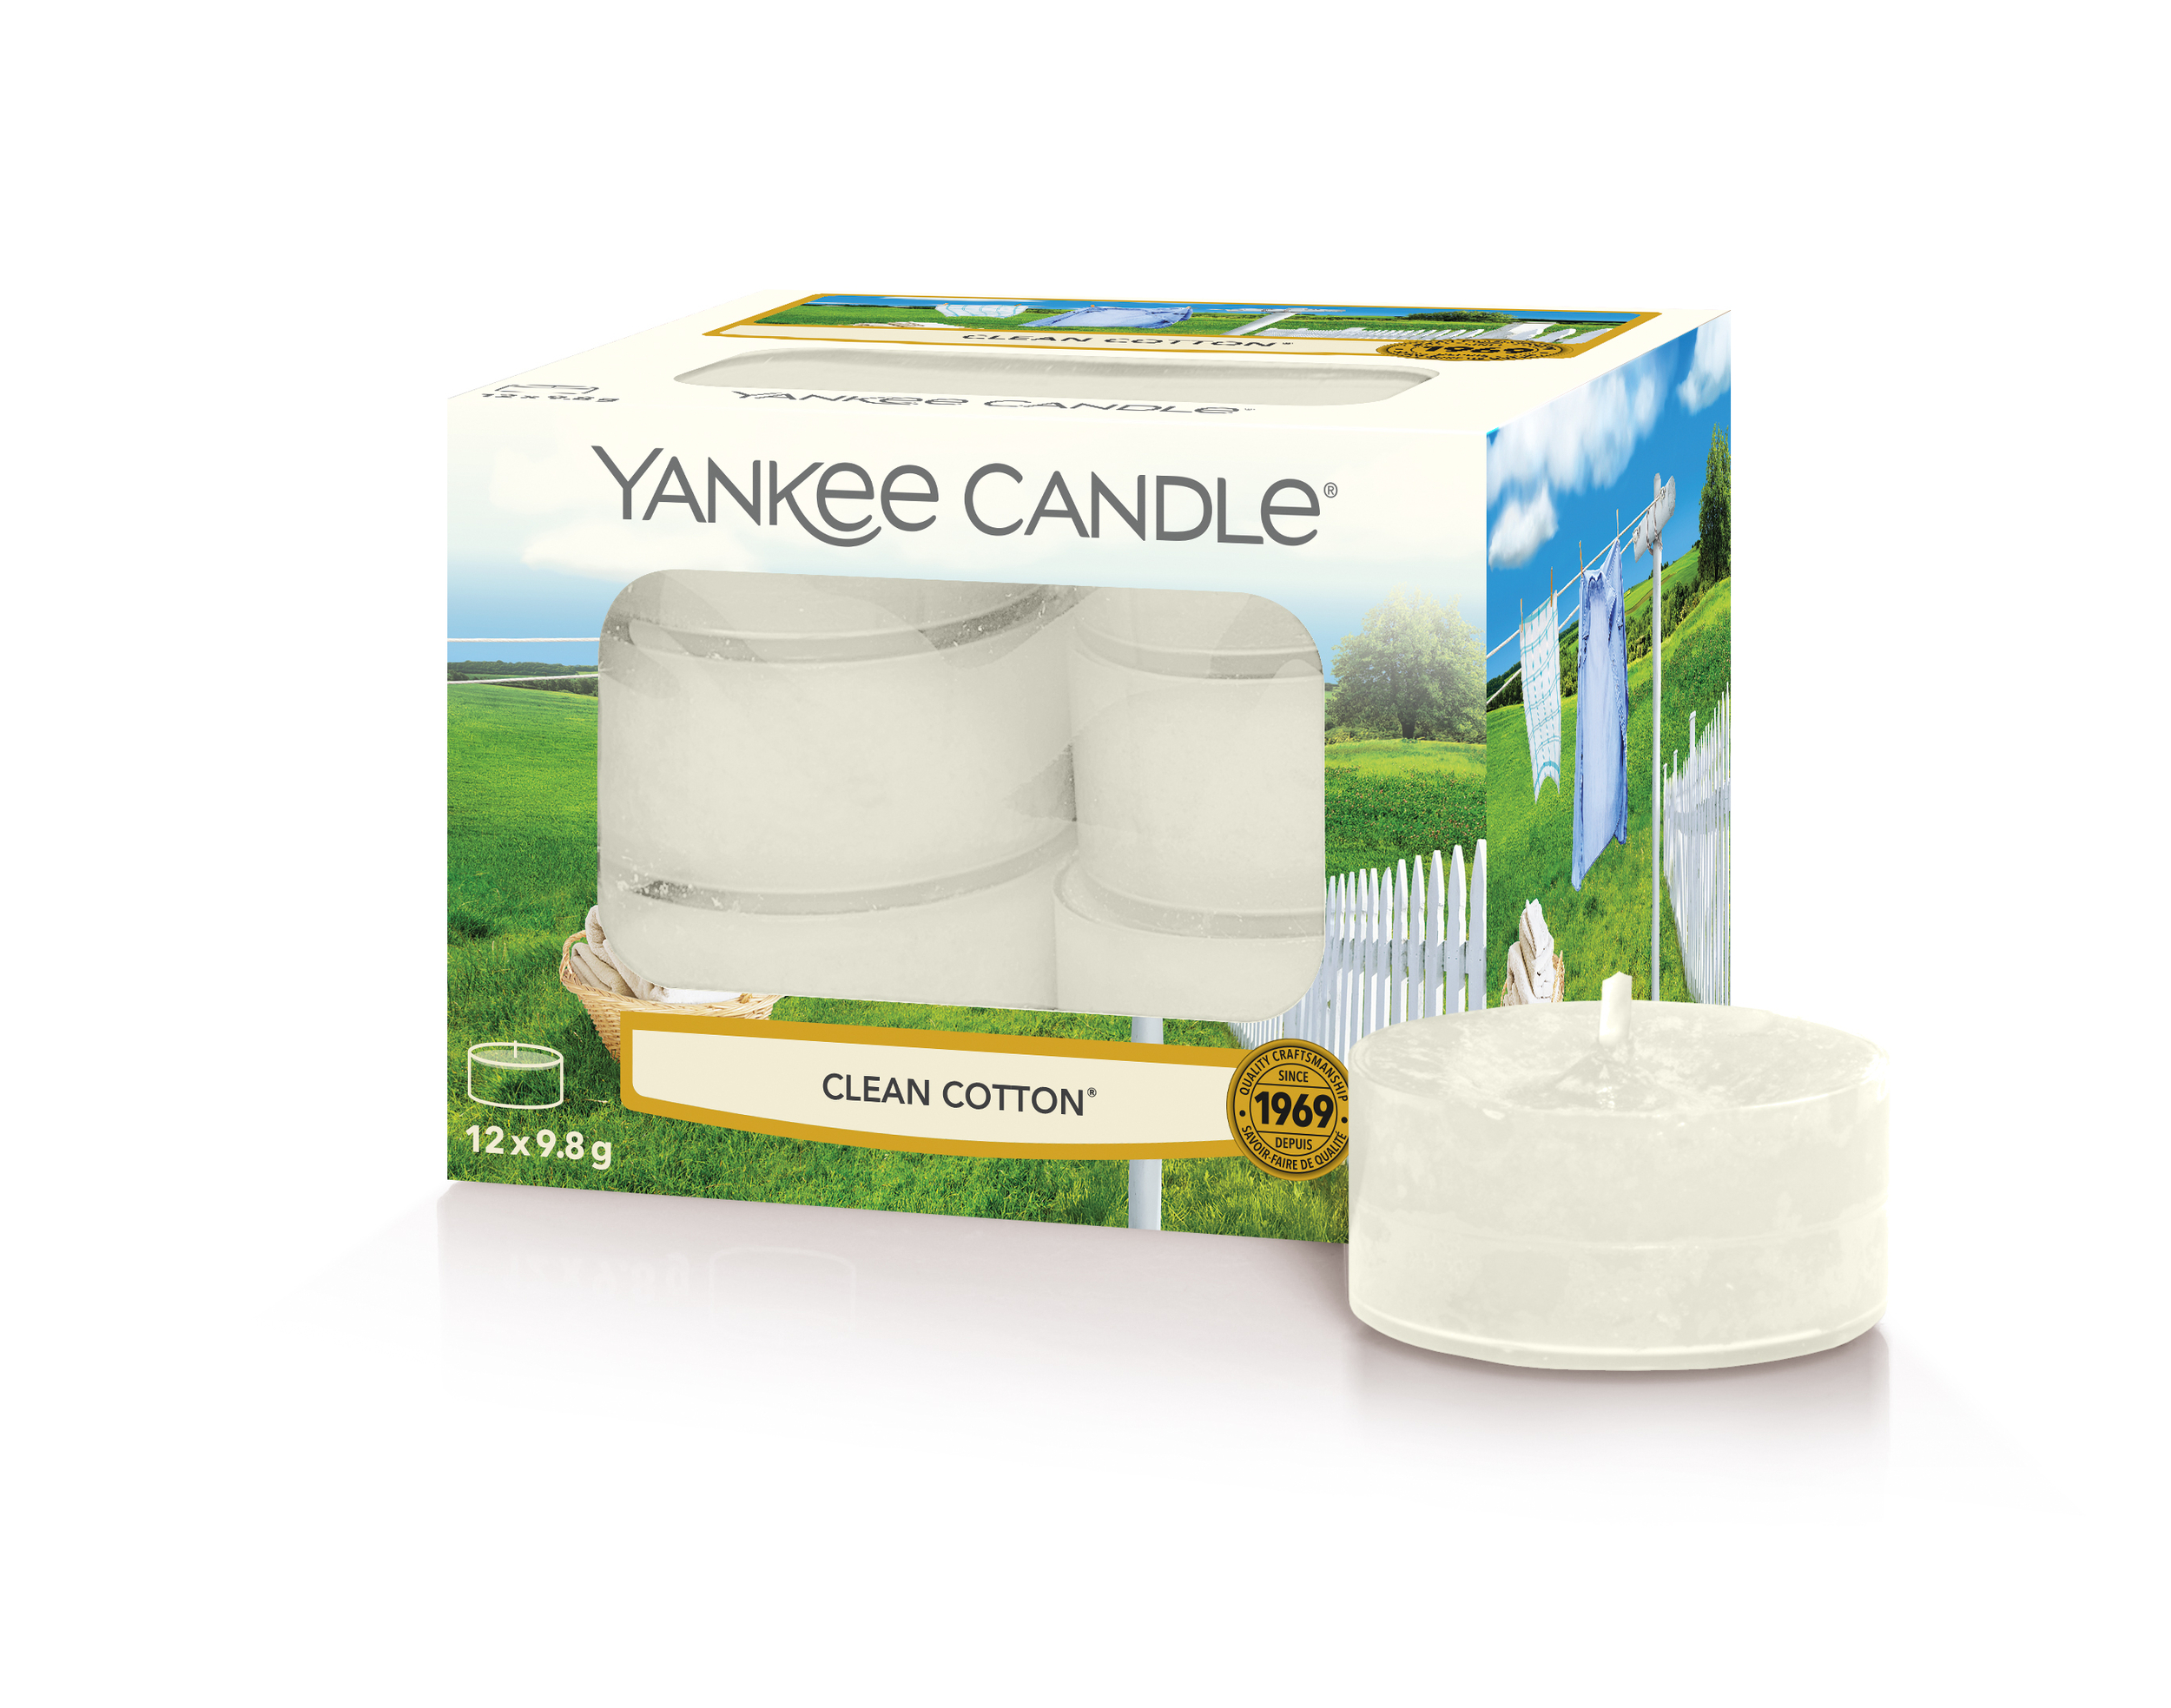 Bougies Clean Cotton (boîte de 12 lumignons-chauffe-plats) - Yankee Candle